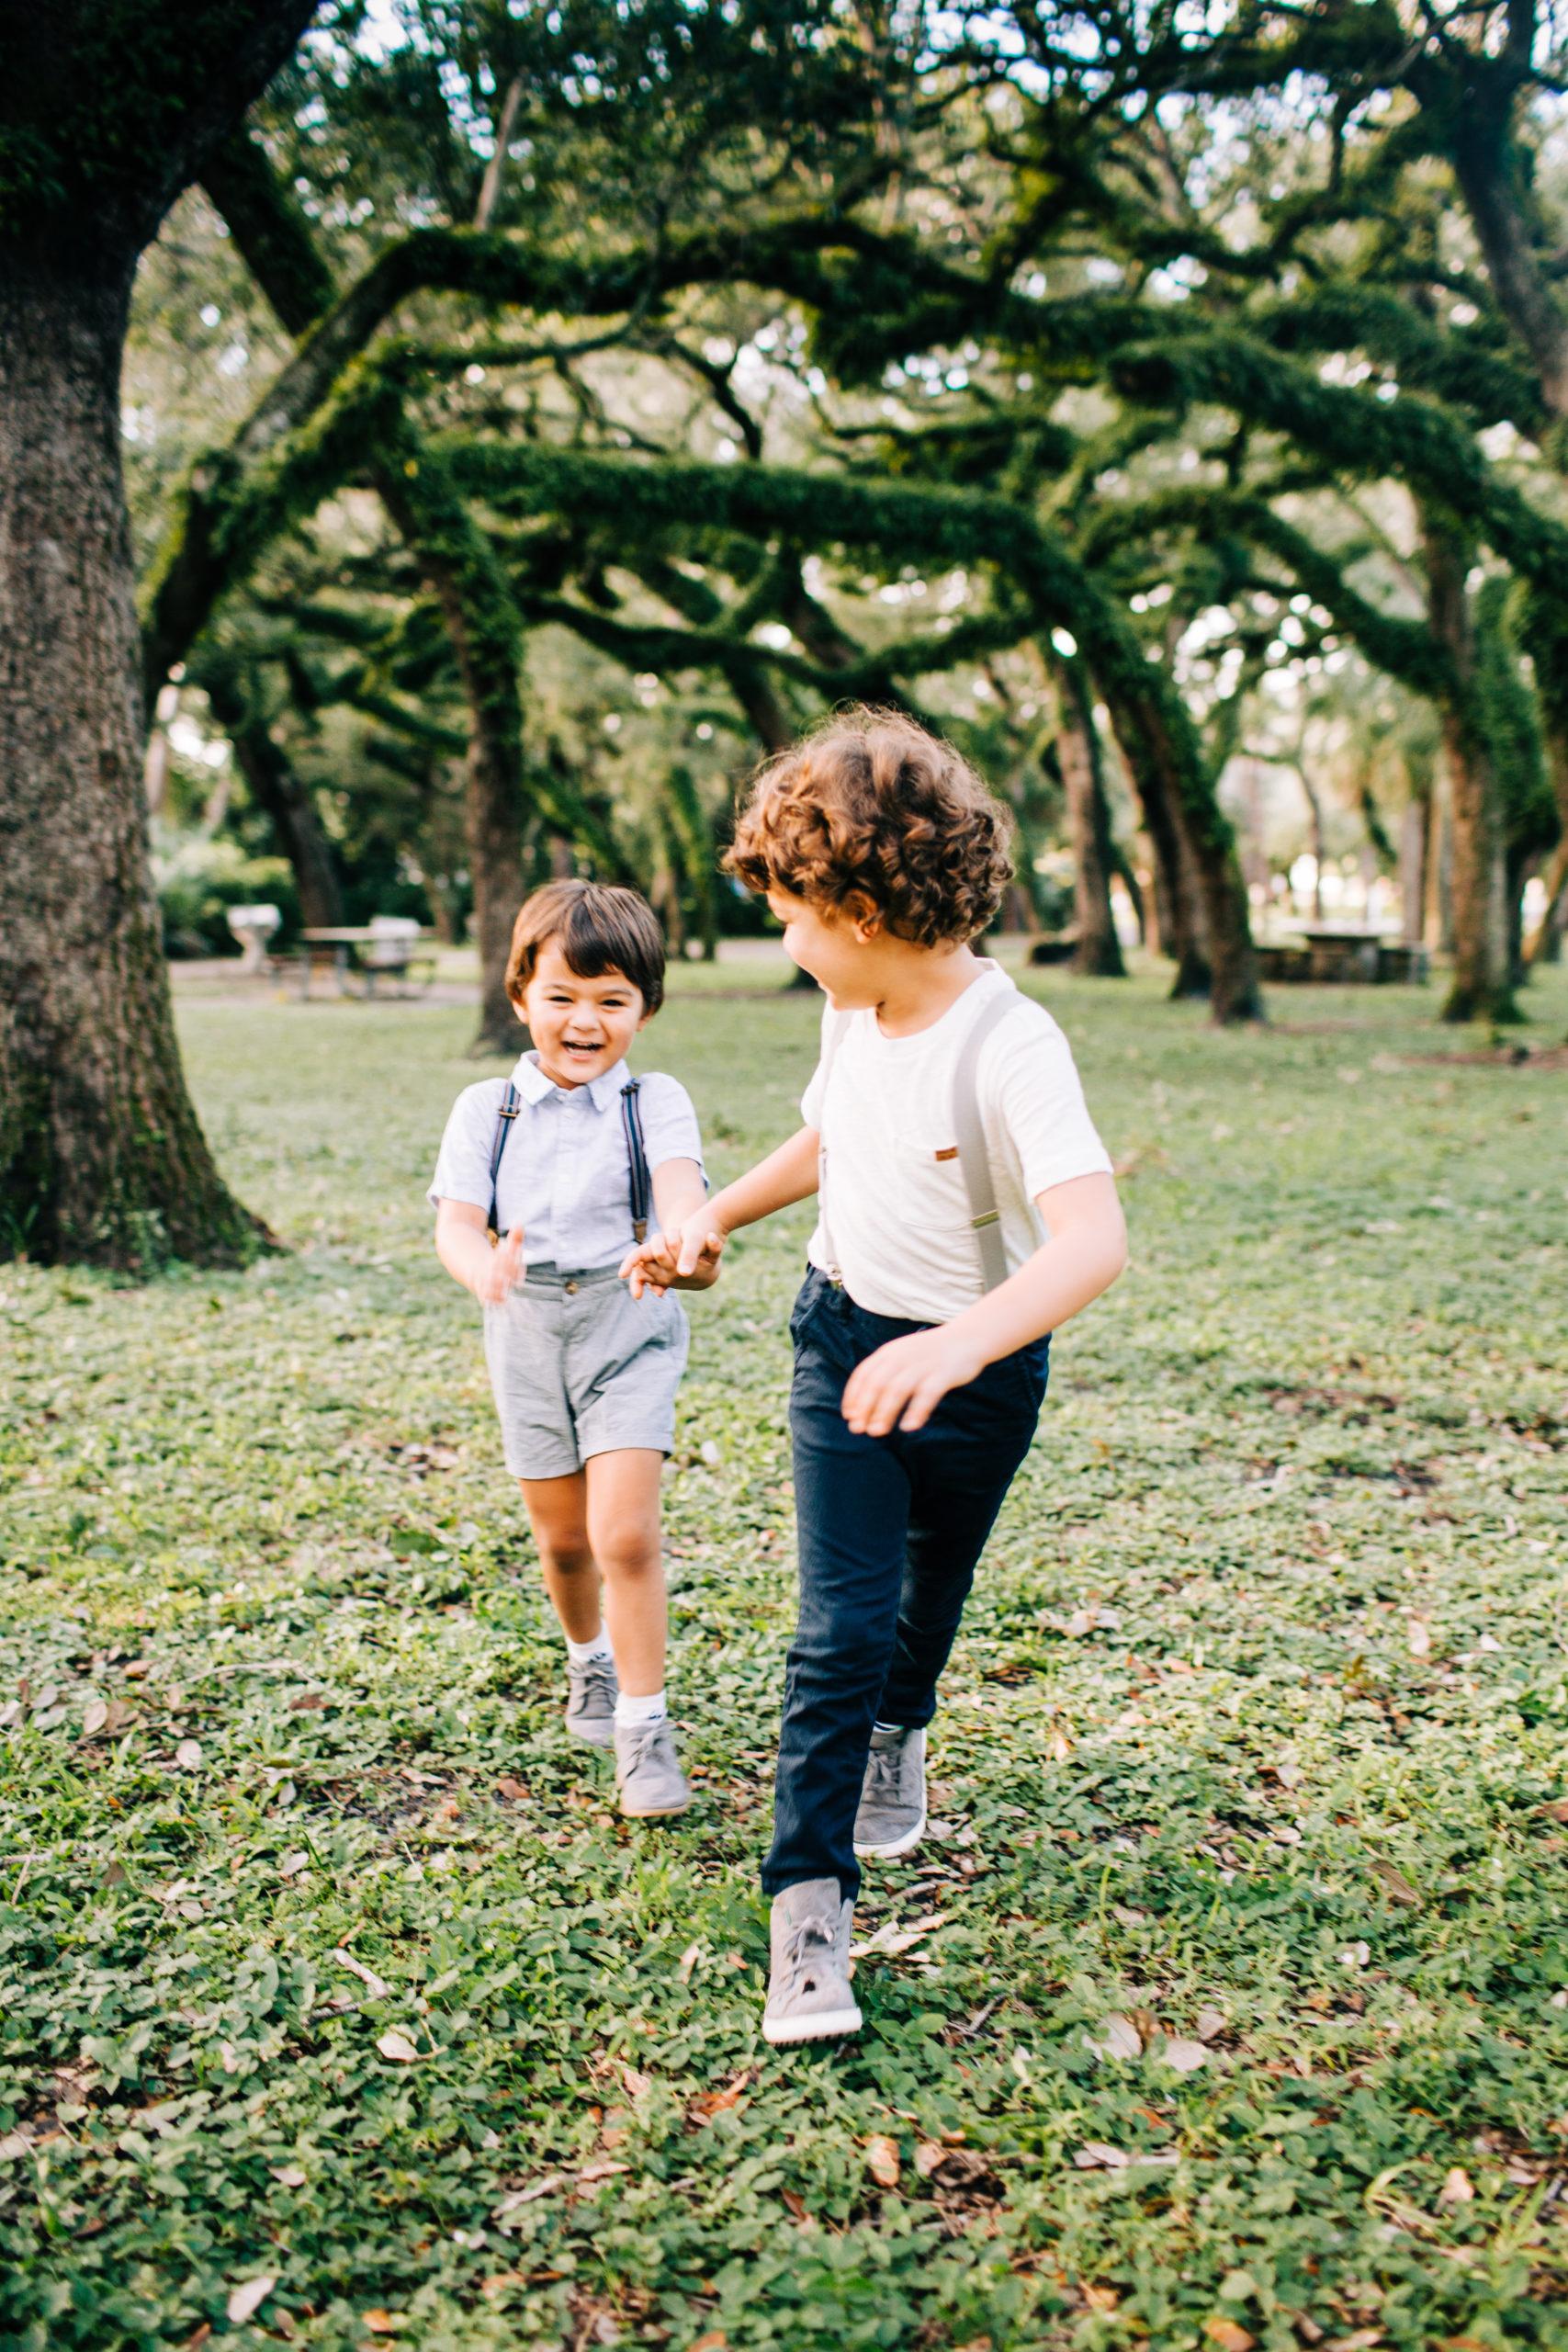 MiamiFamilyPhotoSession-7-scaled Family Photo Session at the Park - Villa Family